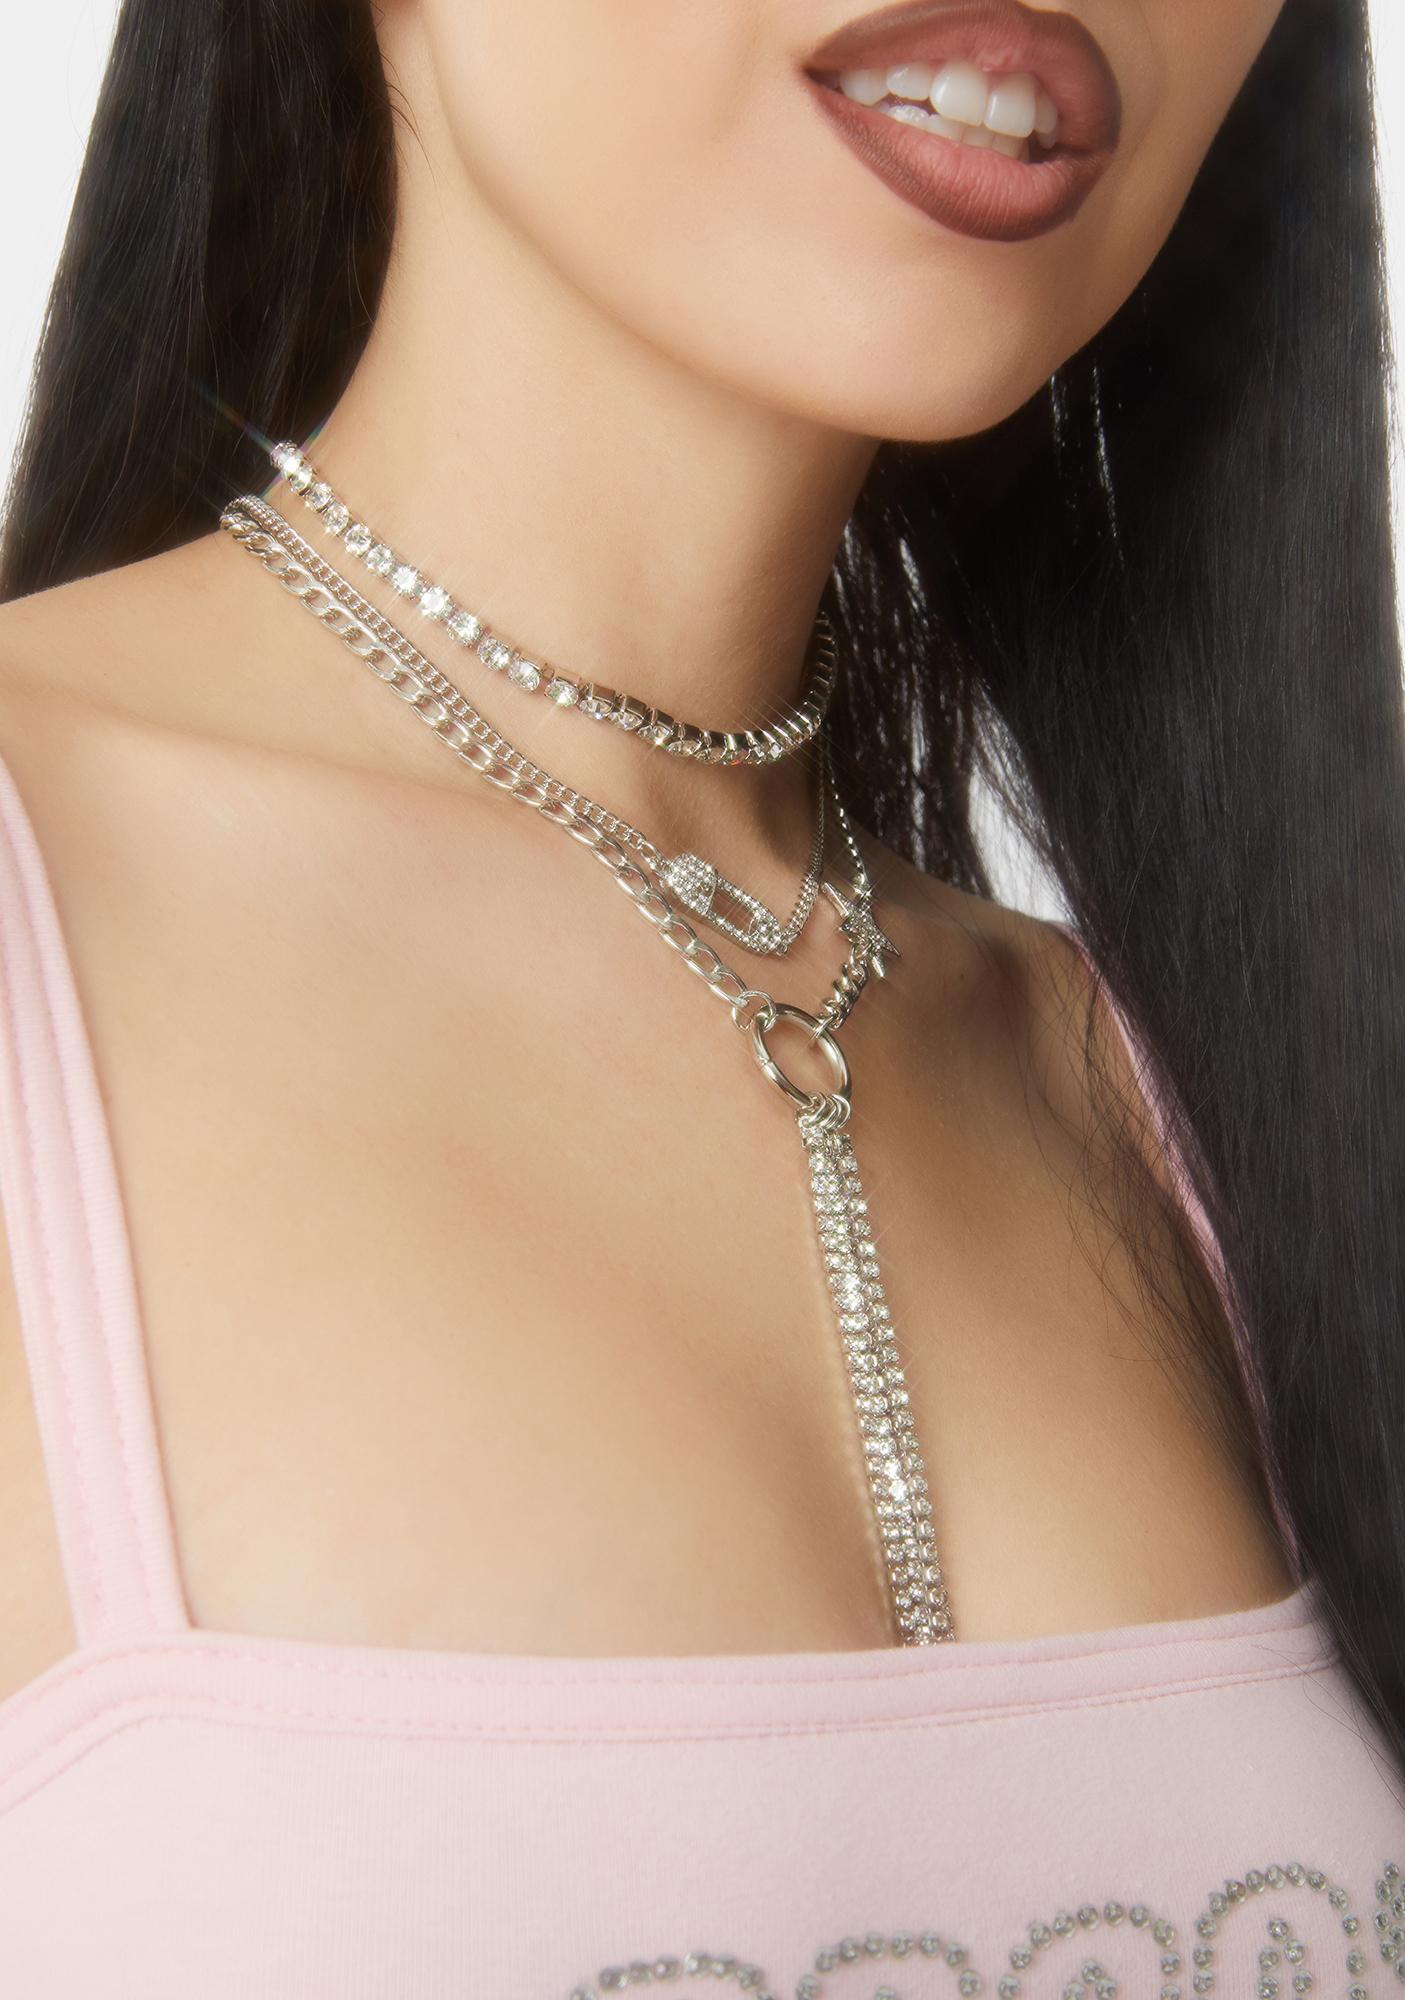 Cups of Stars Layered Rhinestone Necklace